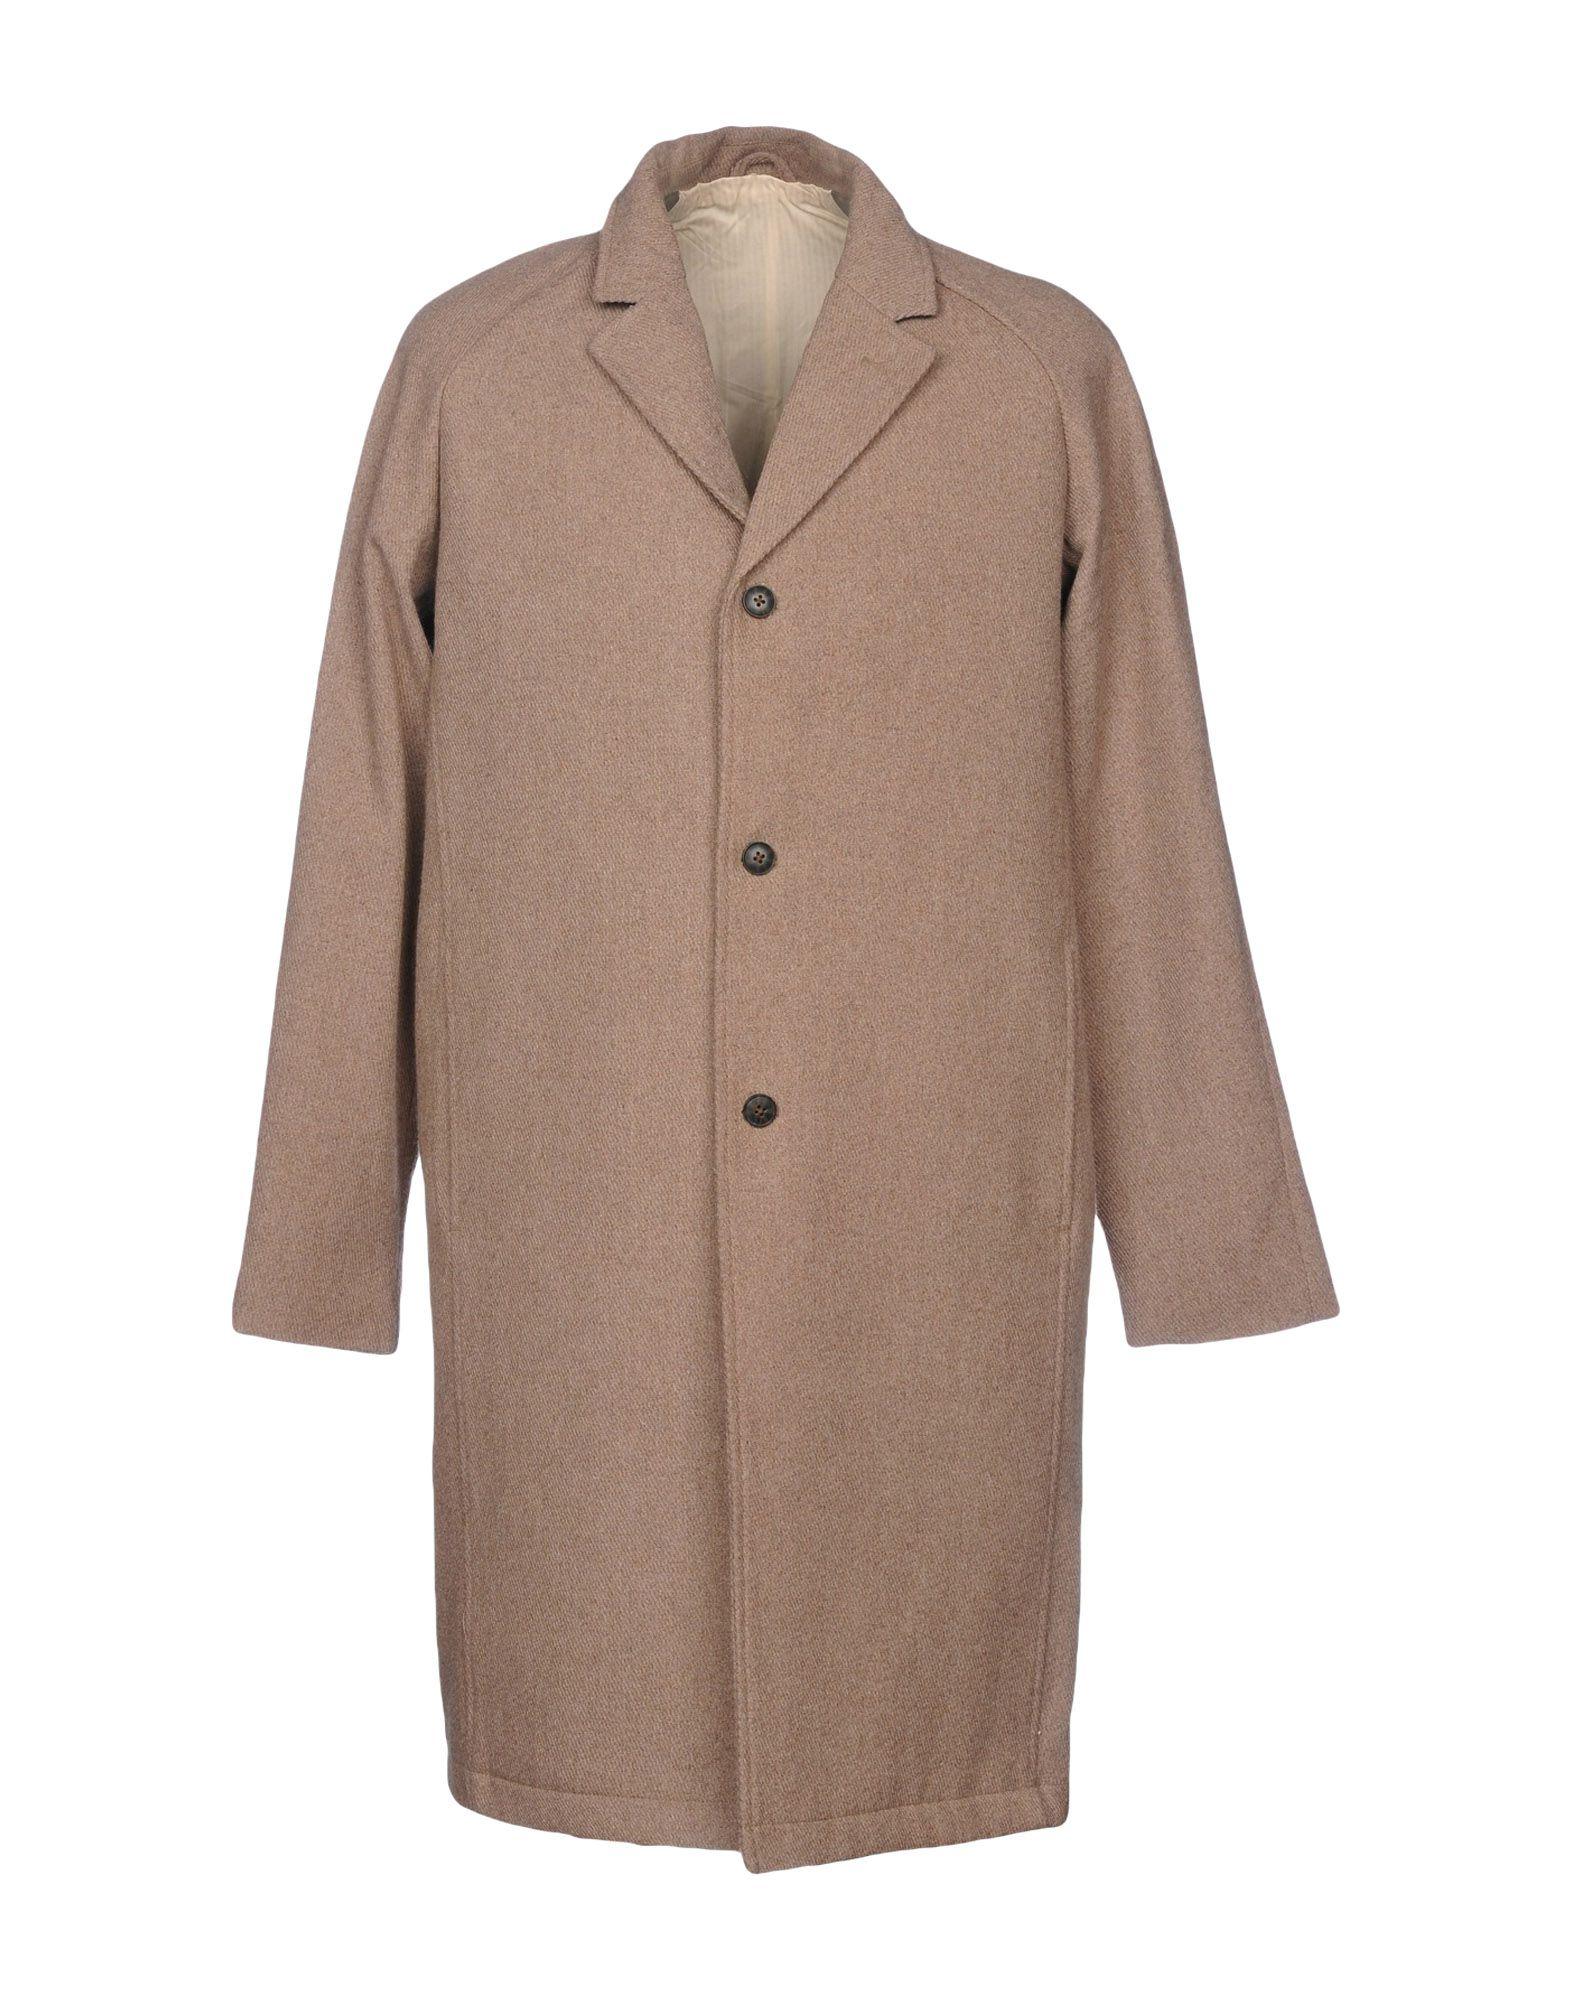 SUIT Coat in Camel